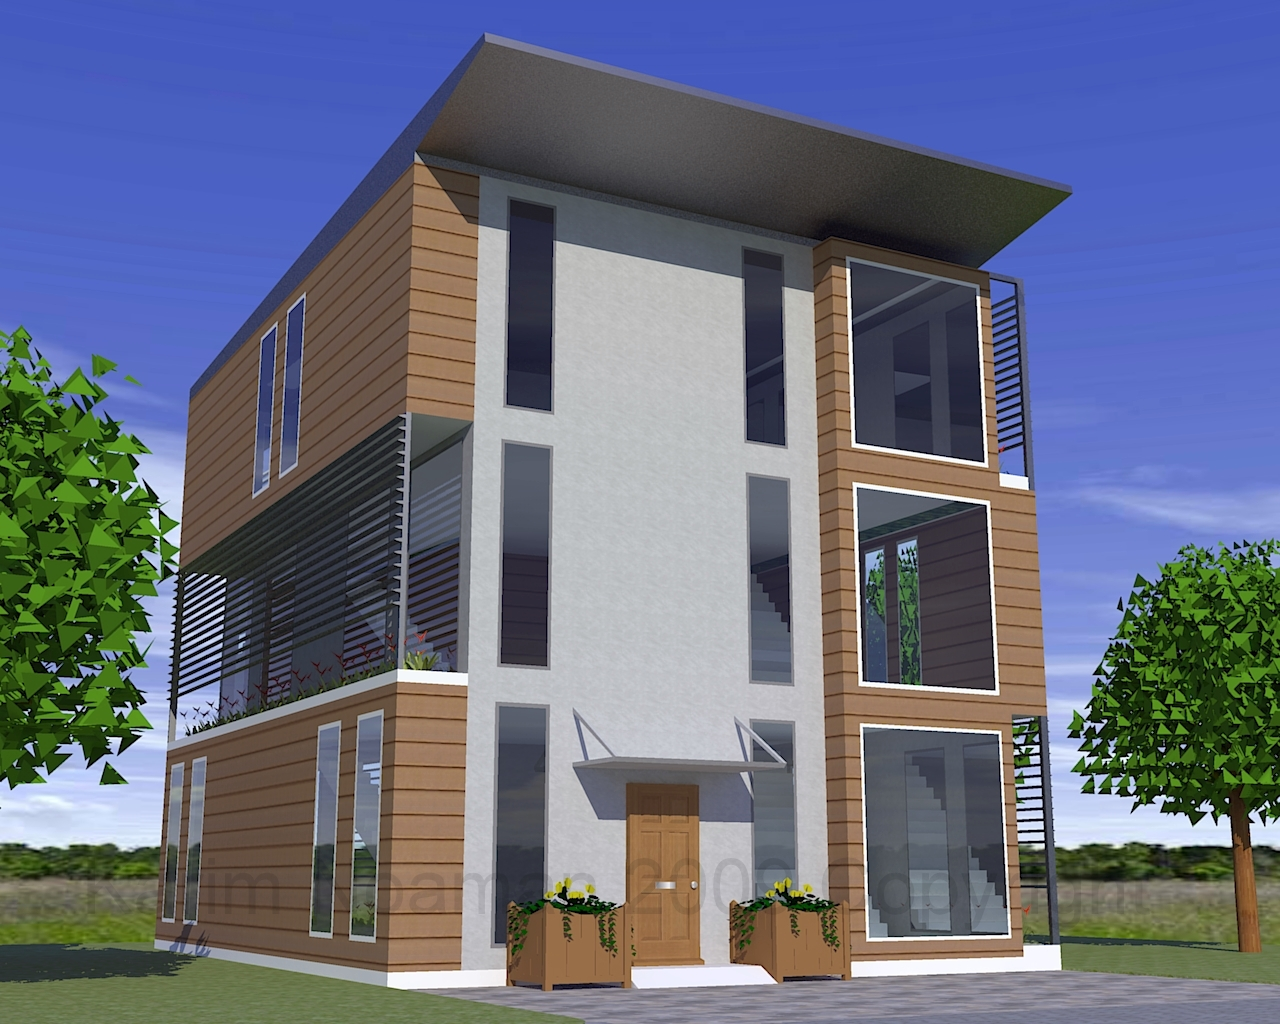 Eco House Design By Knoaman On Deviantart